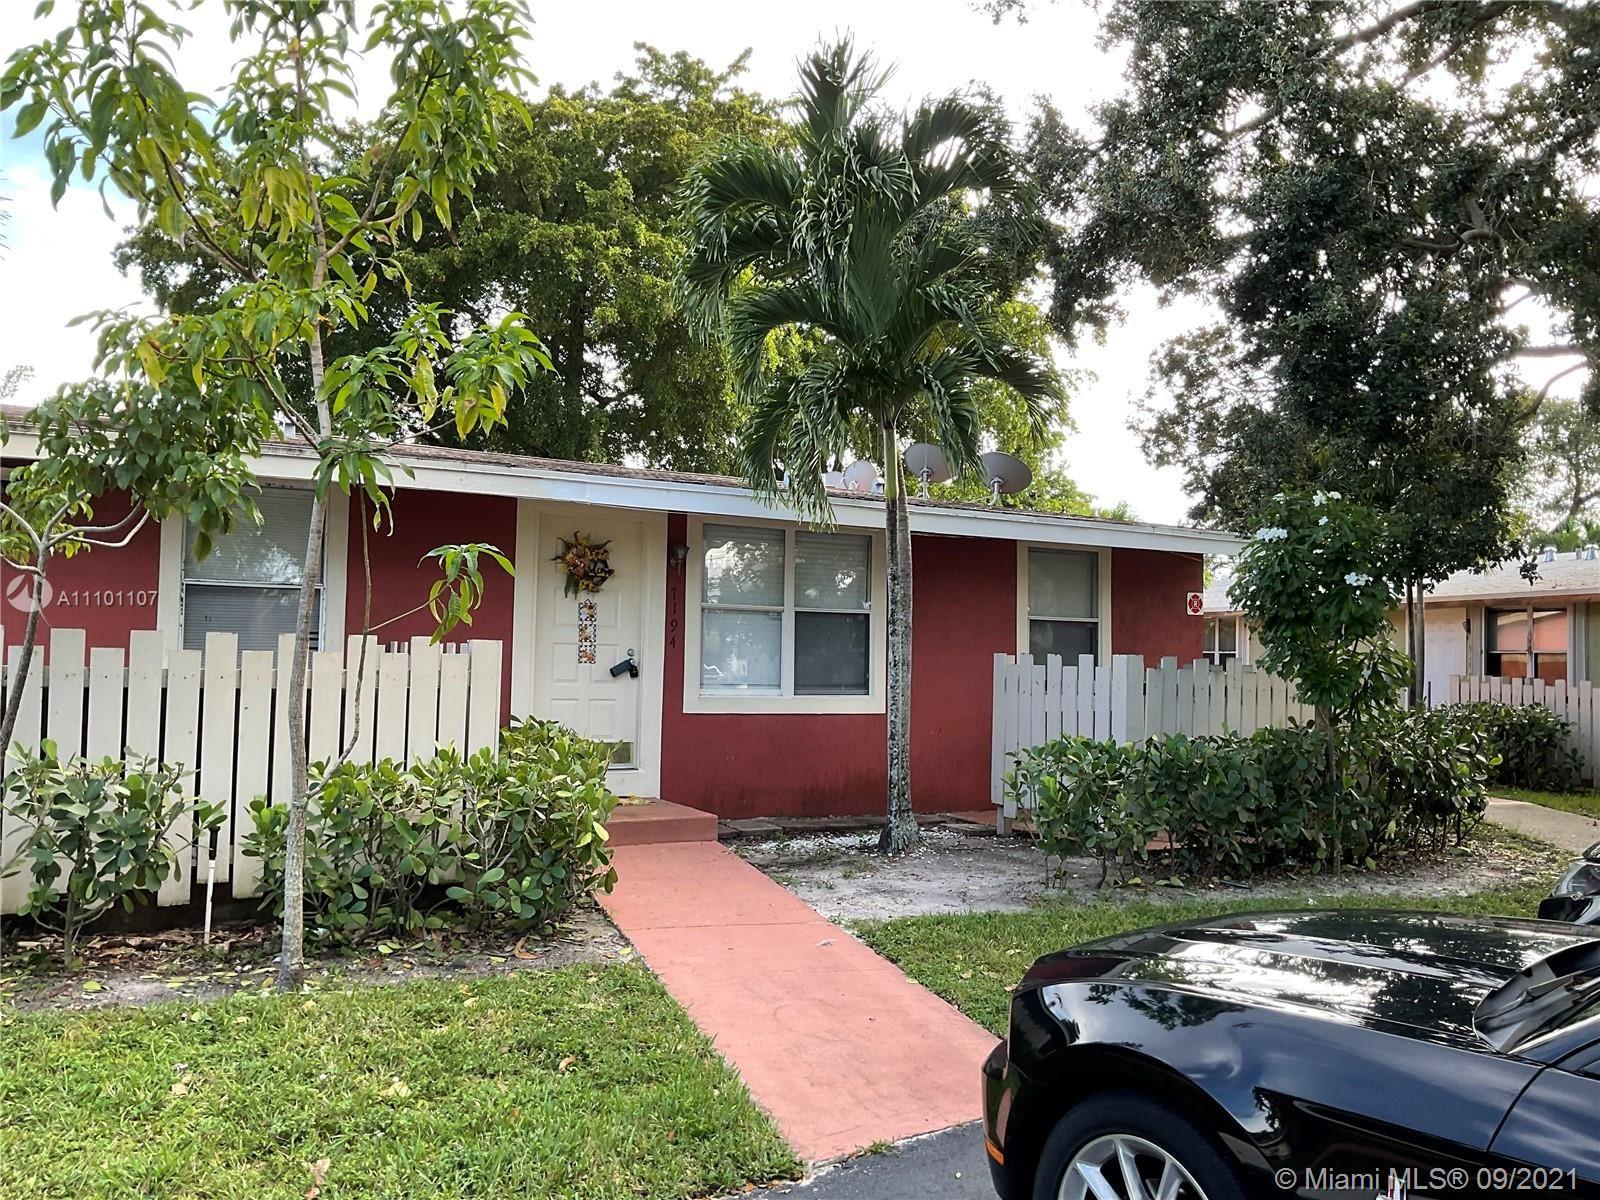 Photo of 7194 Southgate Blvd #7194, Tamarac, FL 33321 (MLS # A11101107)